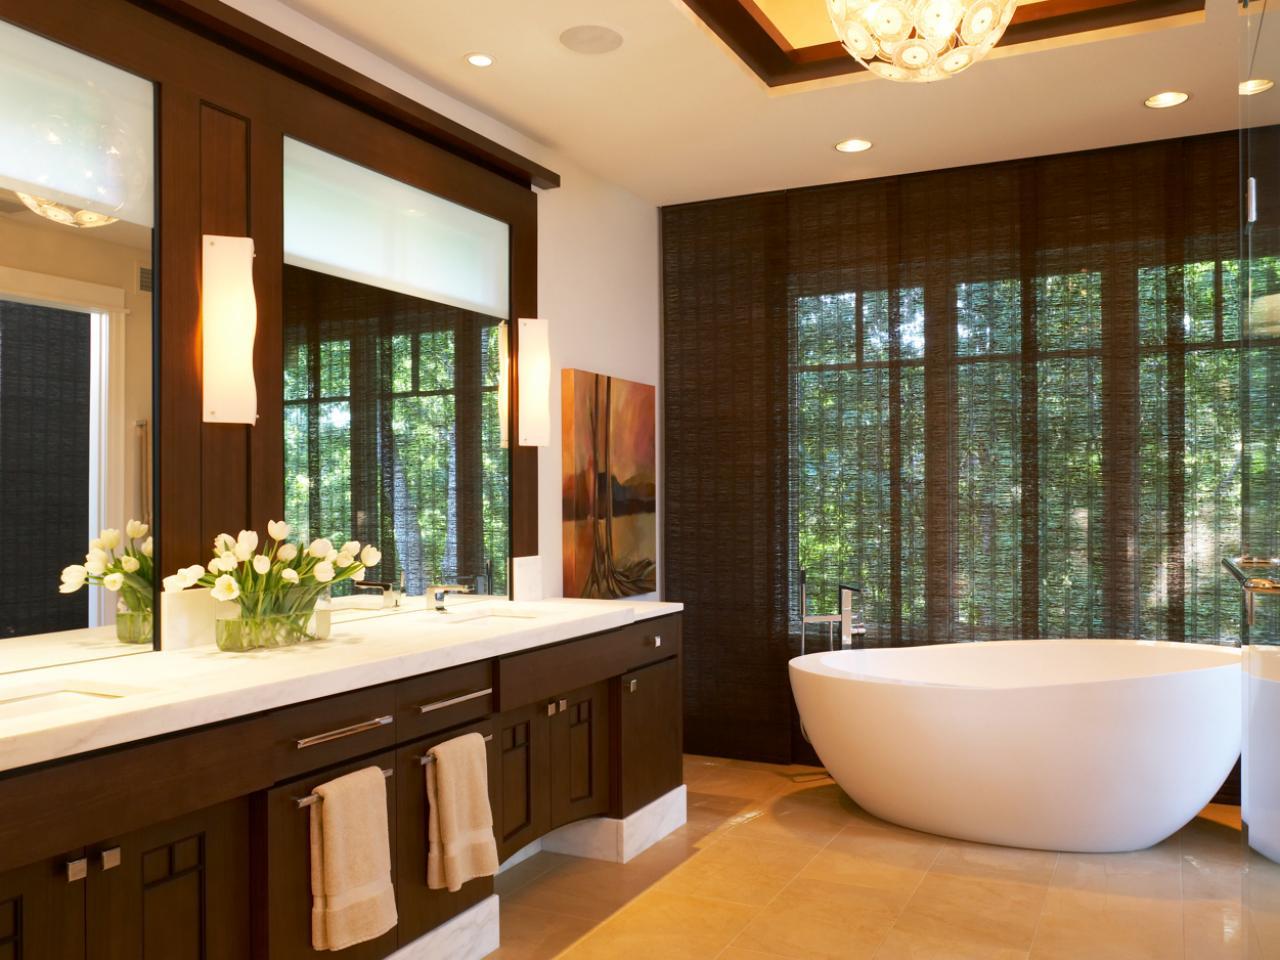 RX-Press-Kits_warmly-yours-electric-flooring-bathroom-tile_s4x3.jpg.rend.hgtvcom.1280.960